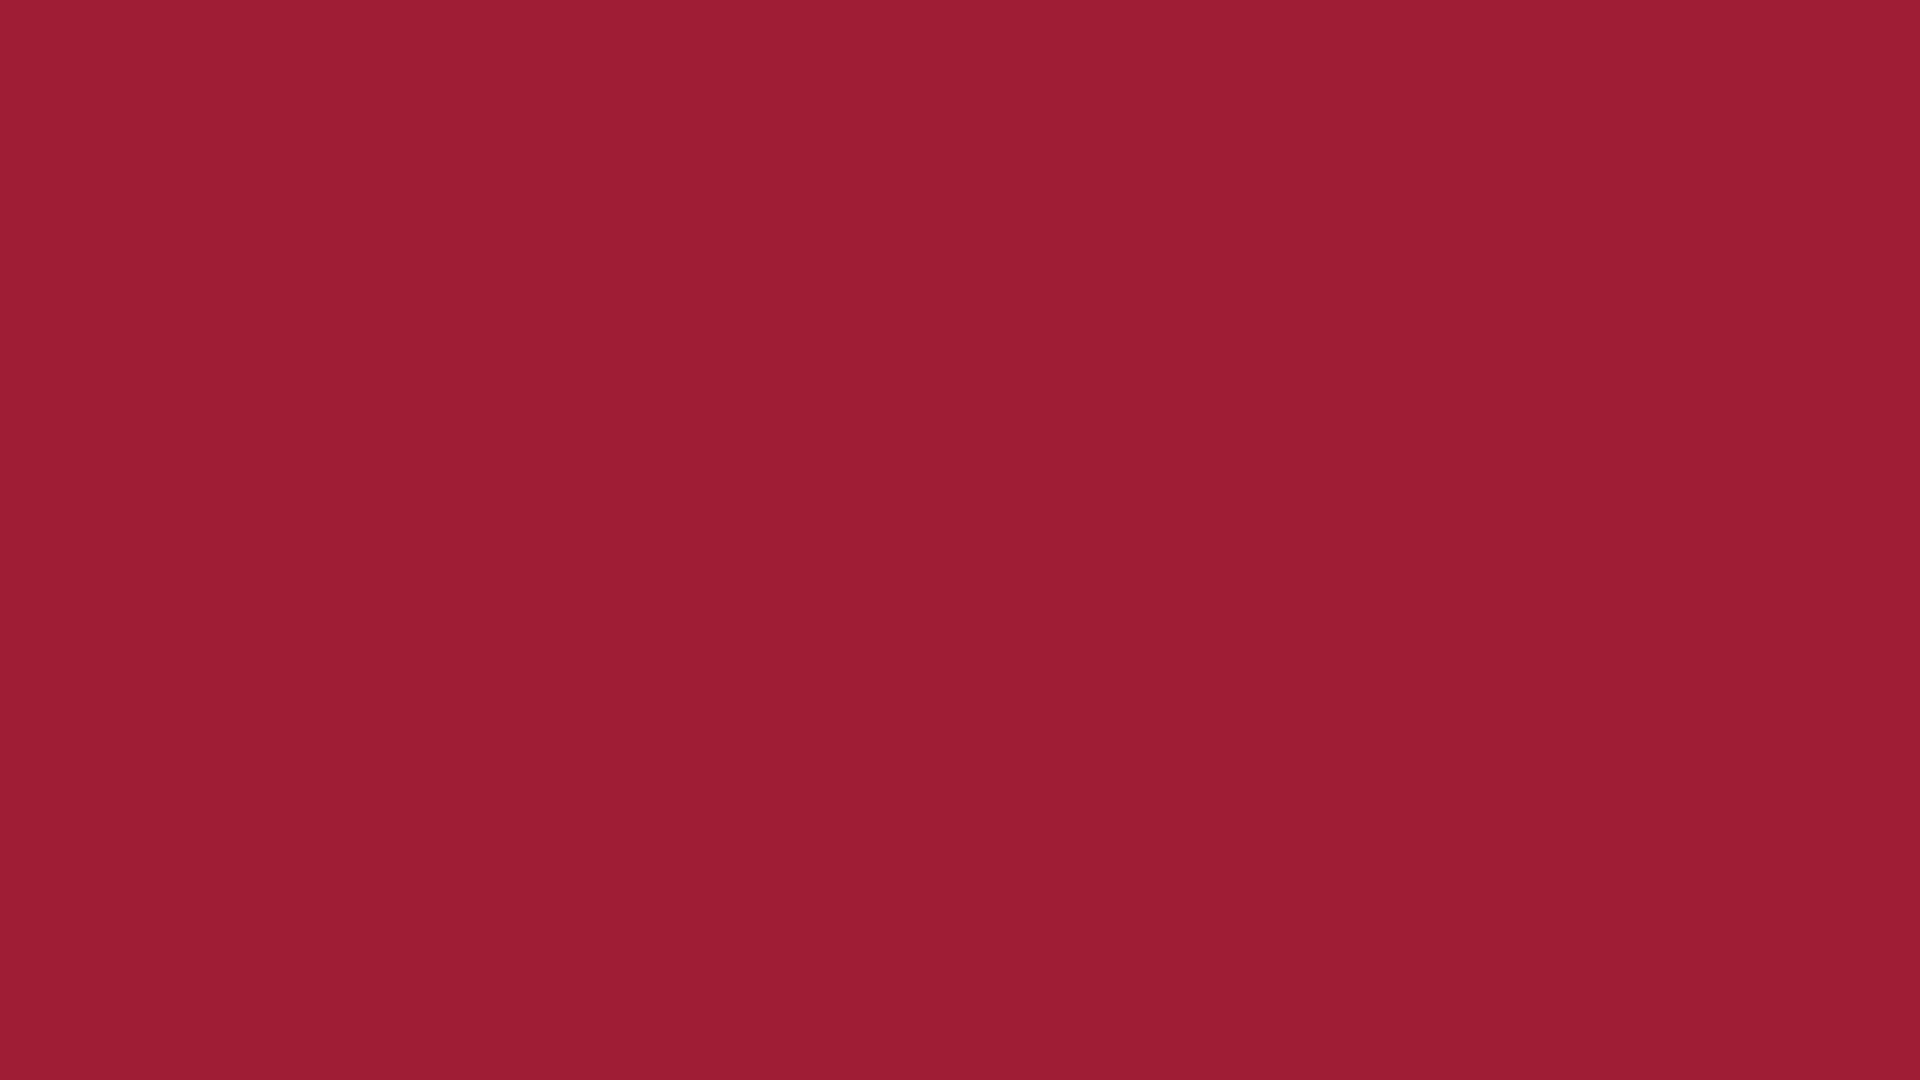 1920x1080 Vivid Burgundy Solid Color Background